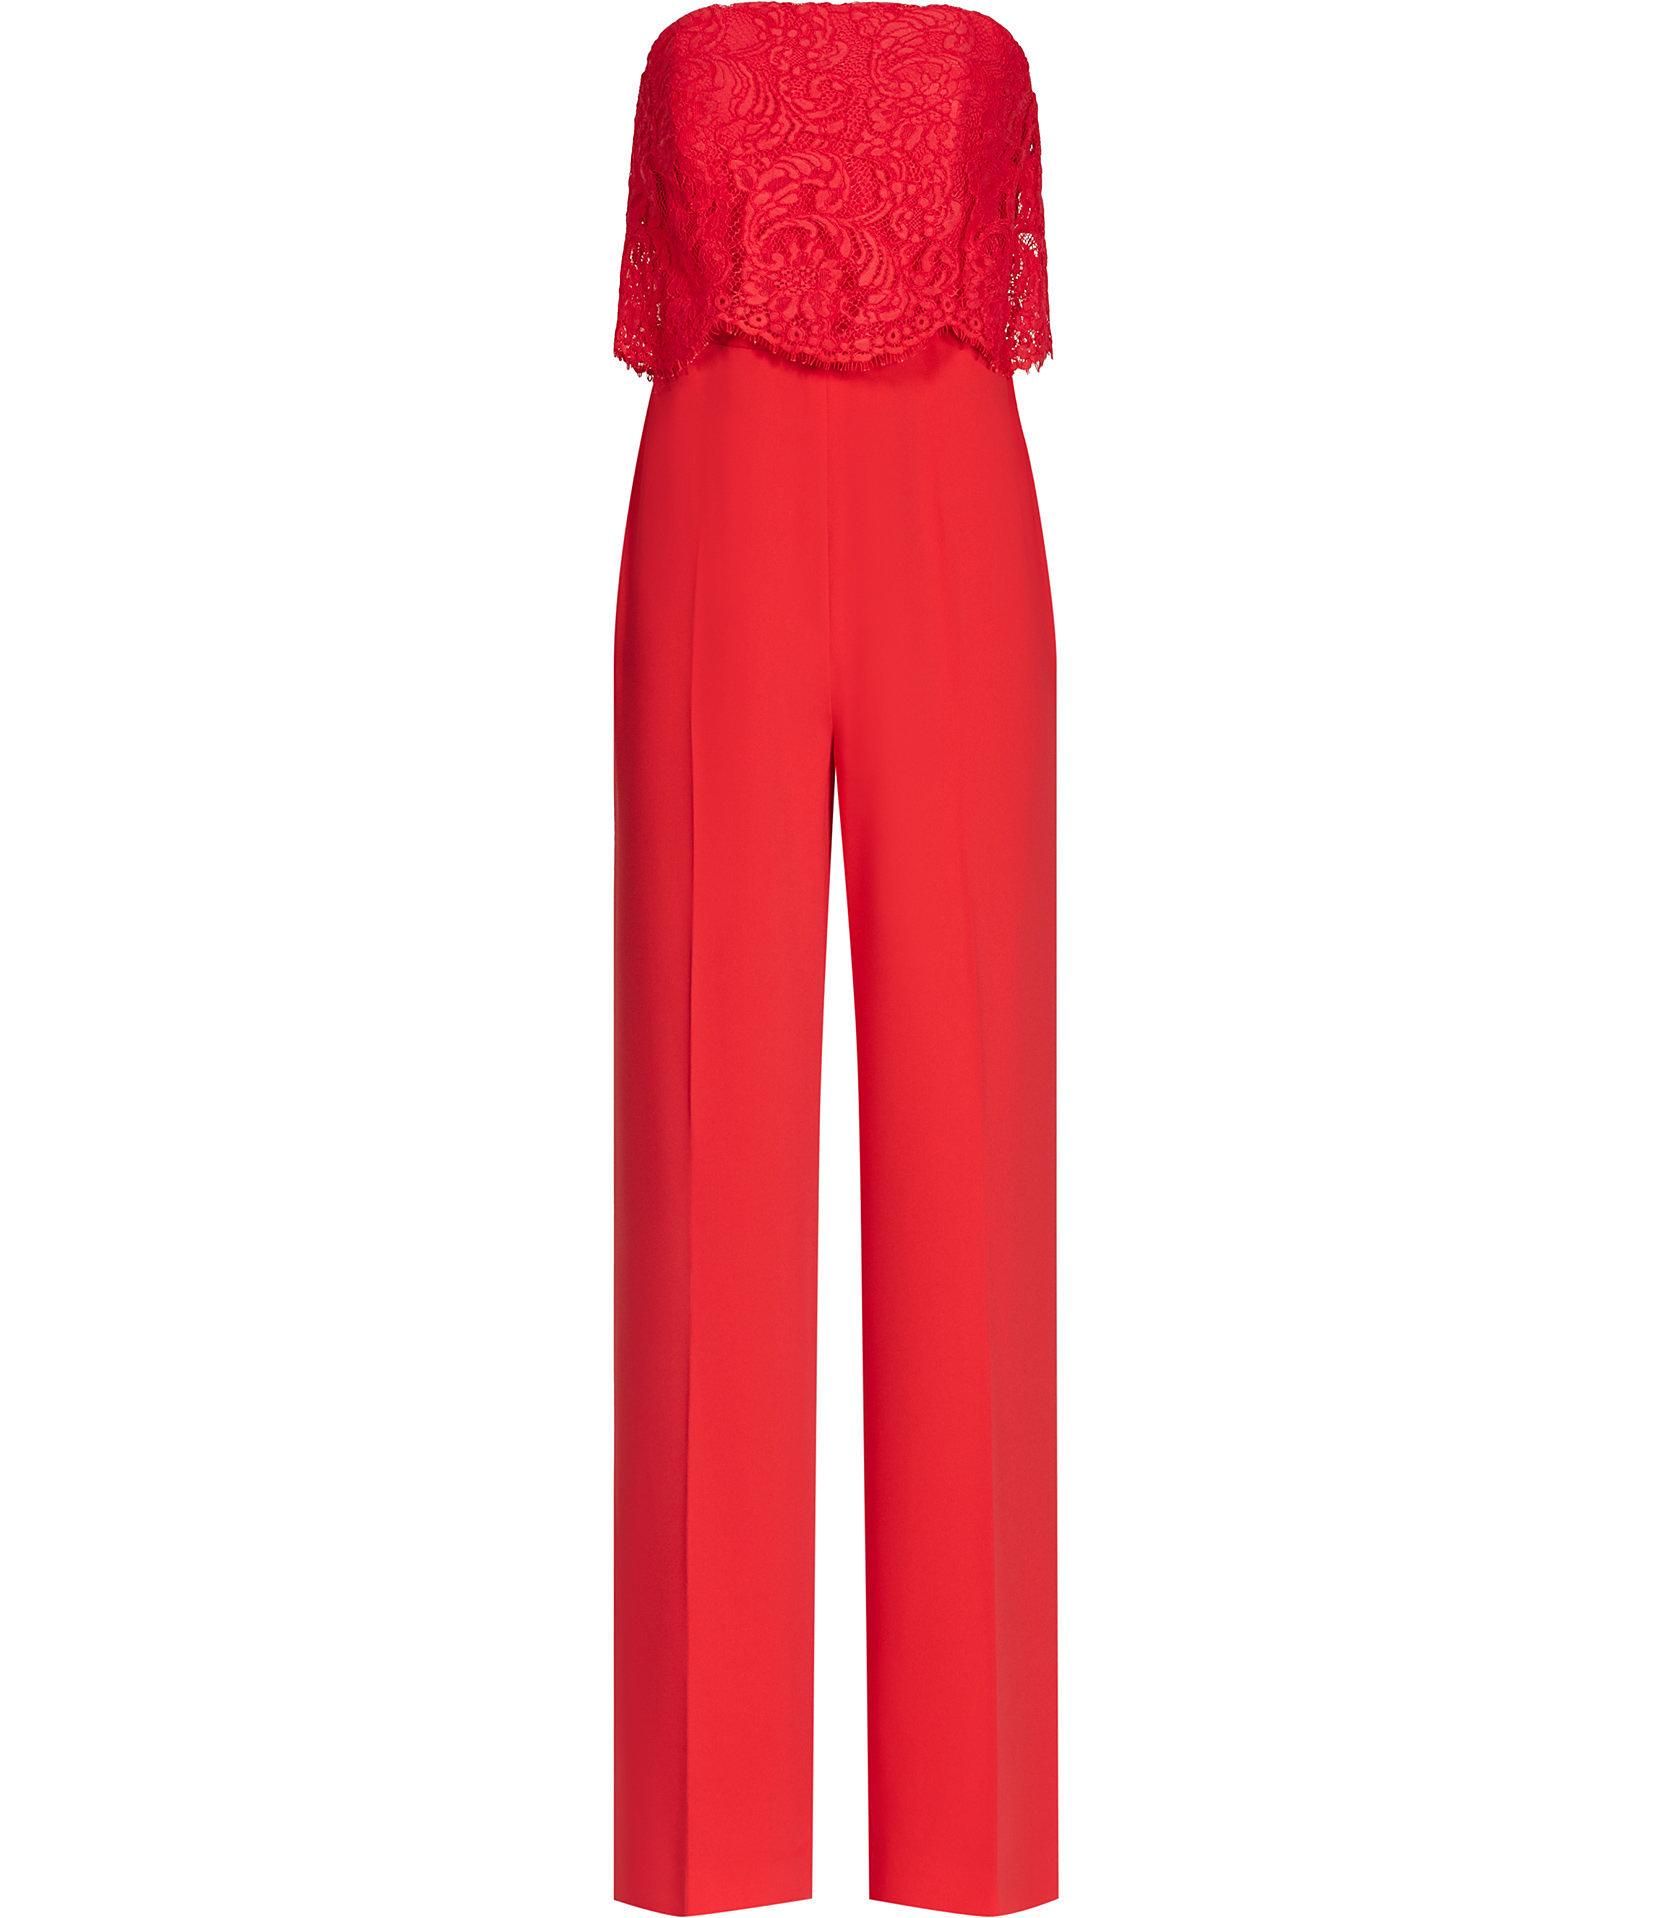 Natalie red jumpsuit 2